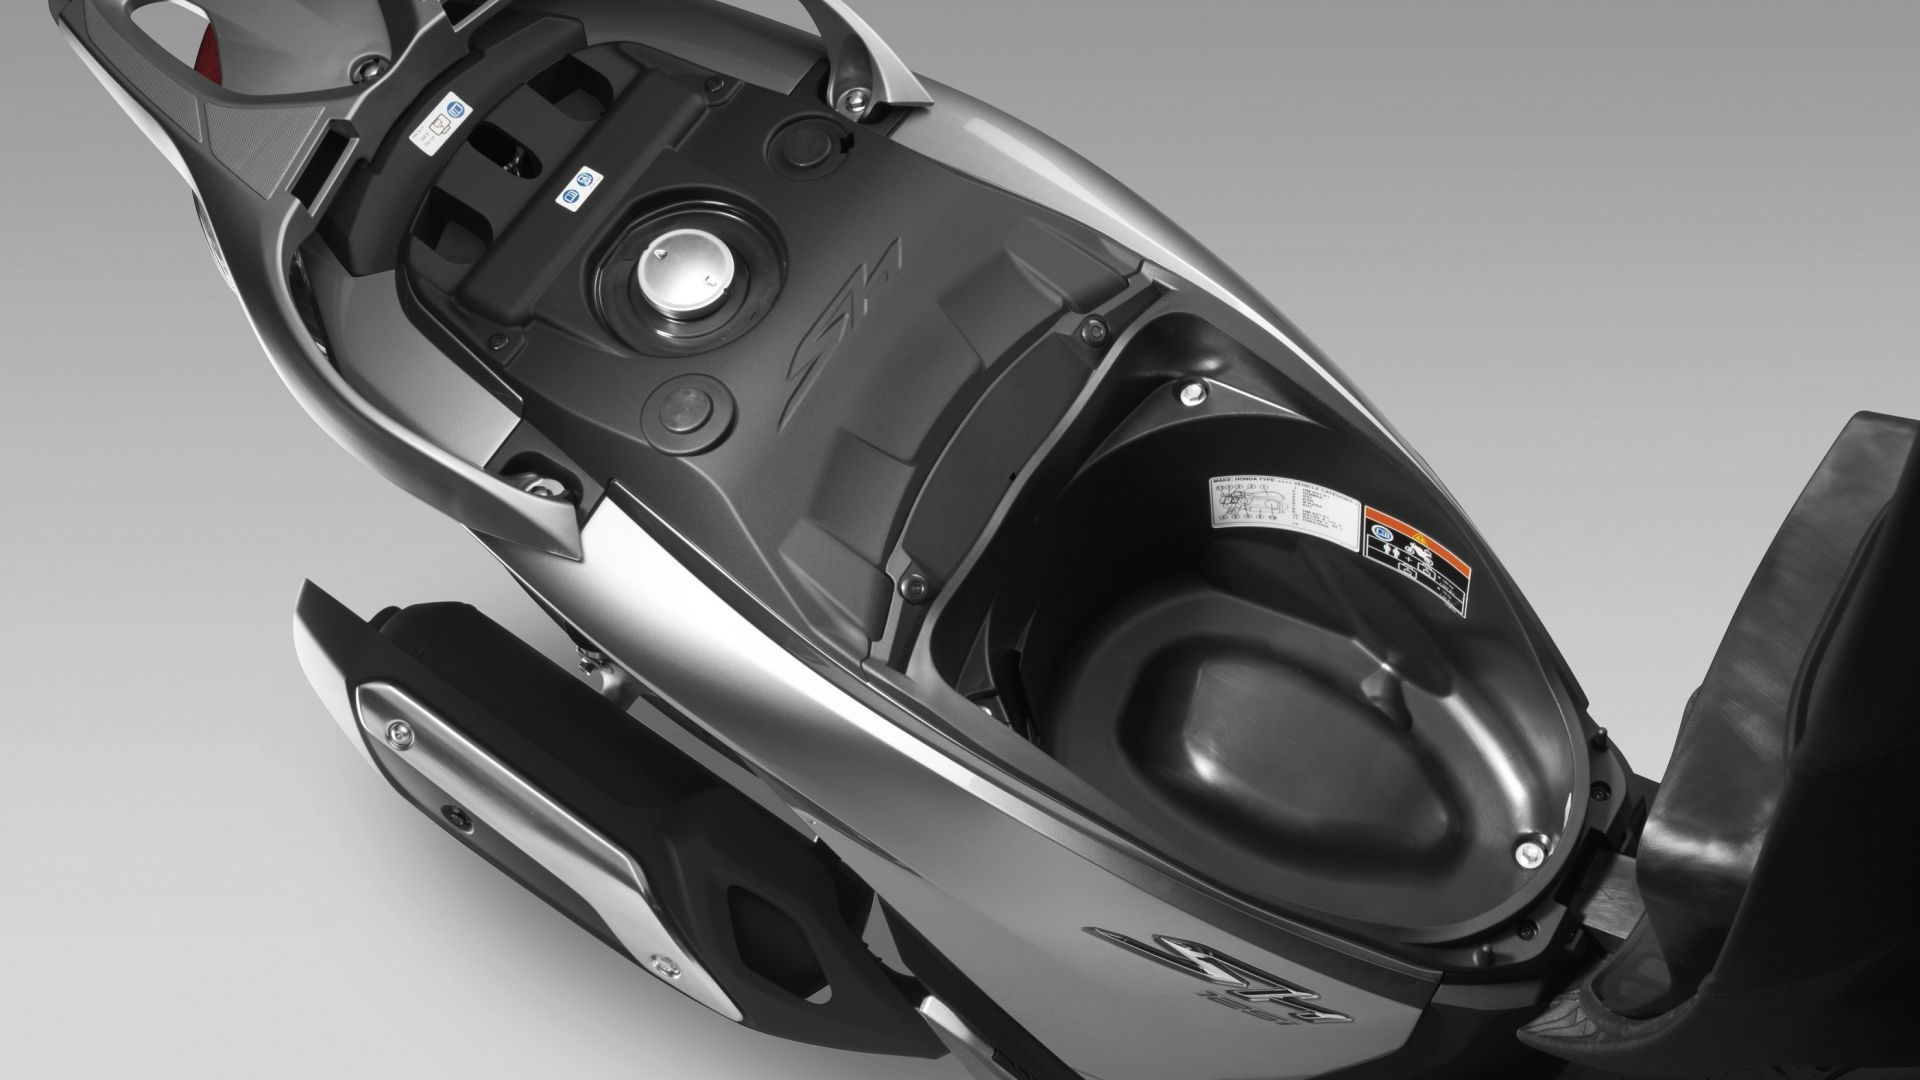 Immagine 28: Honda SH 125/150i ABS 2013